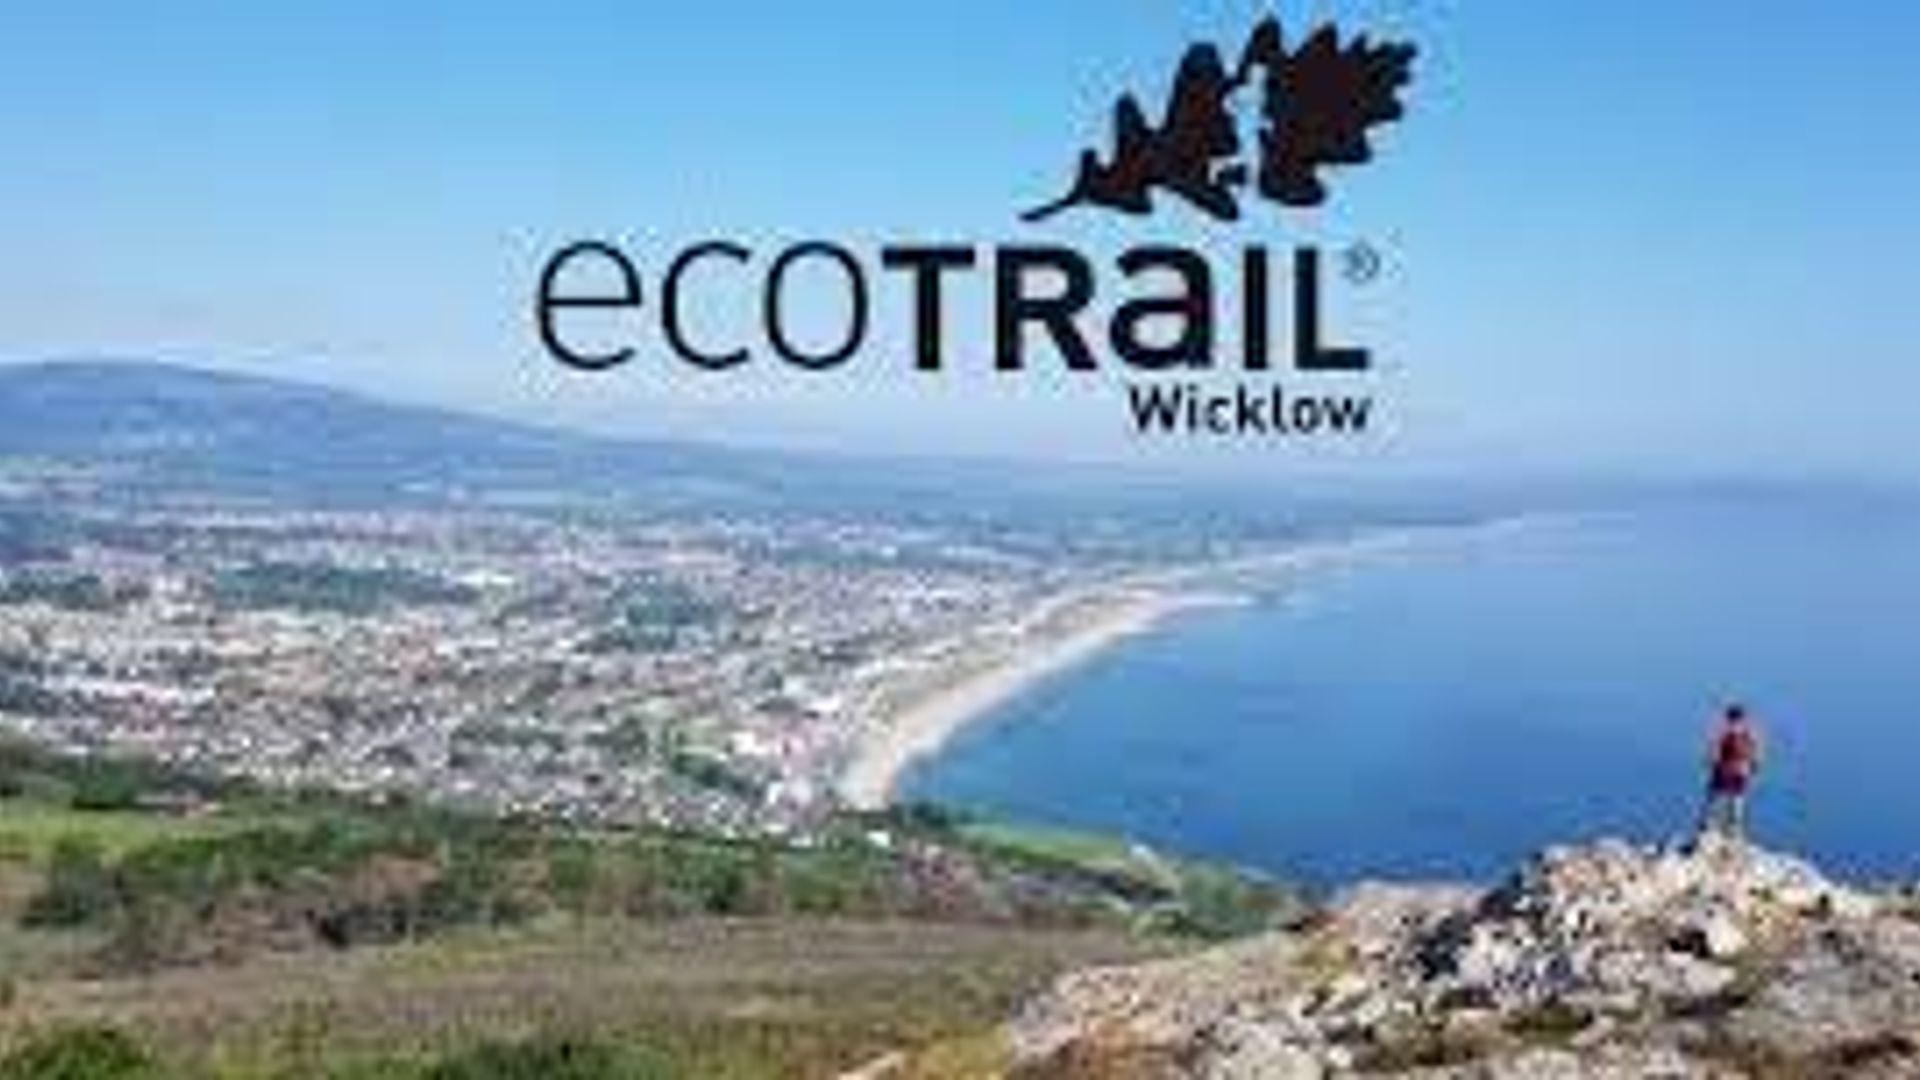 2020 Wicklow Trail Challenge 29k